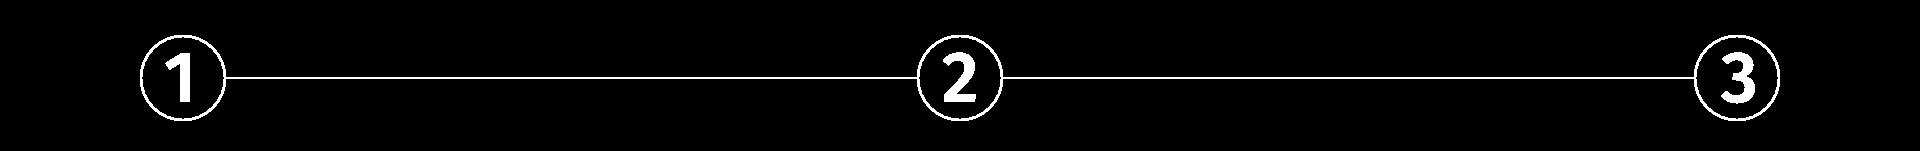 1 2 3 graphic